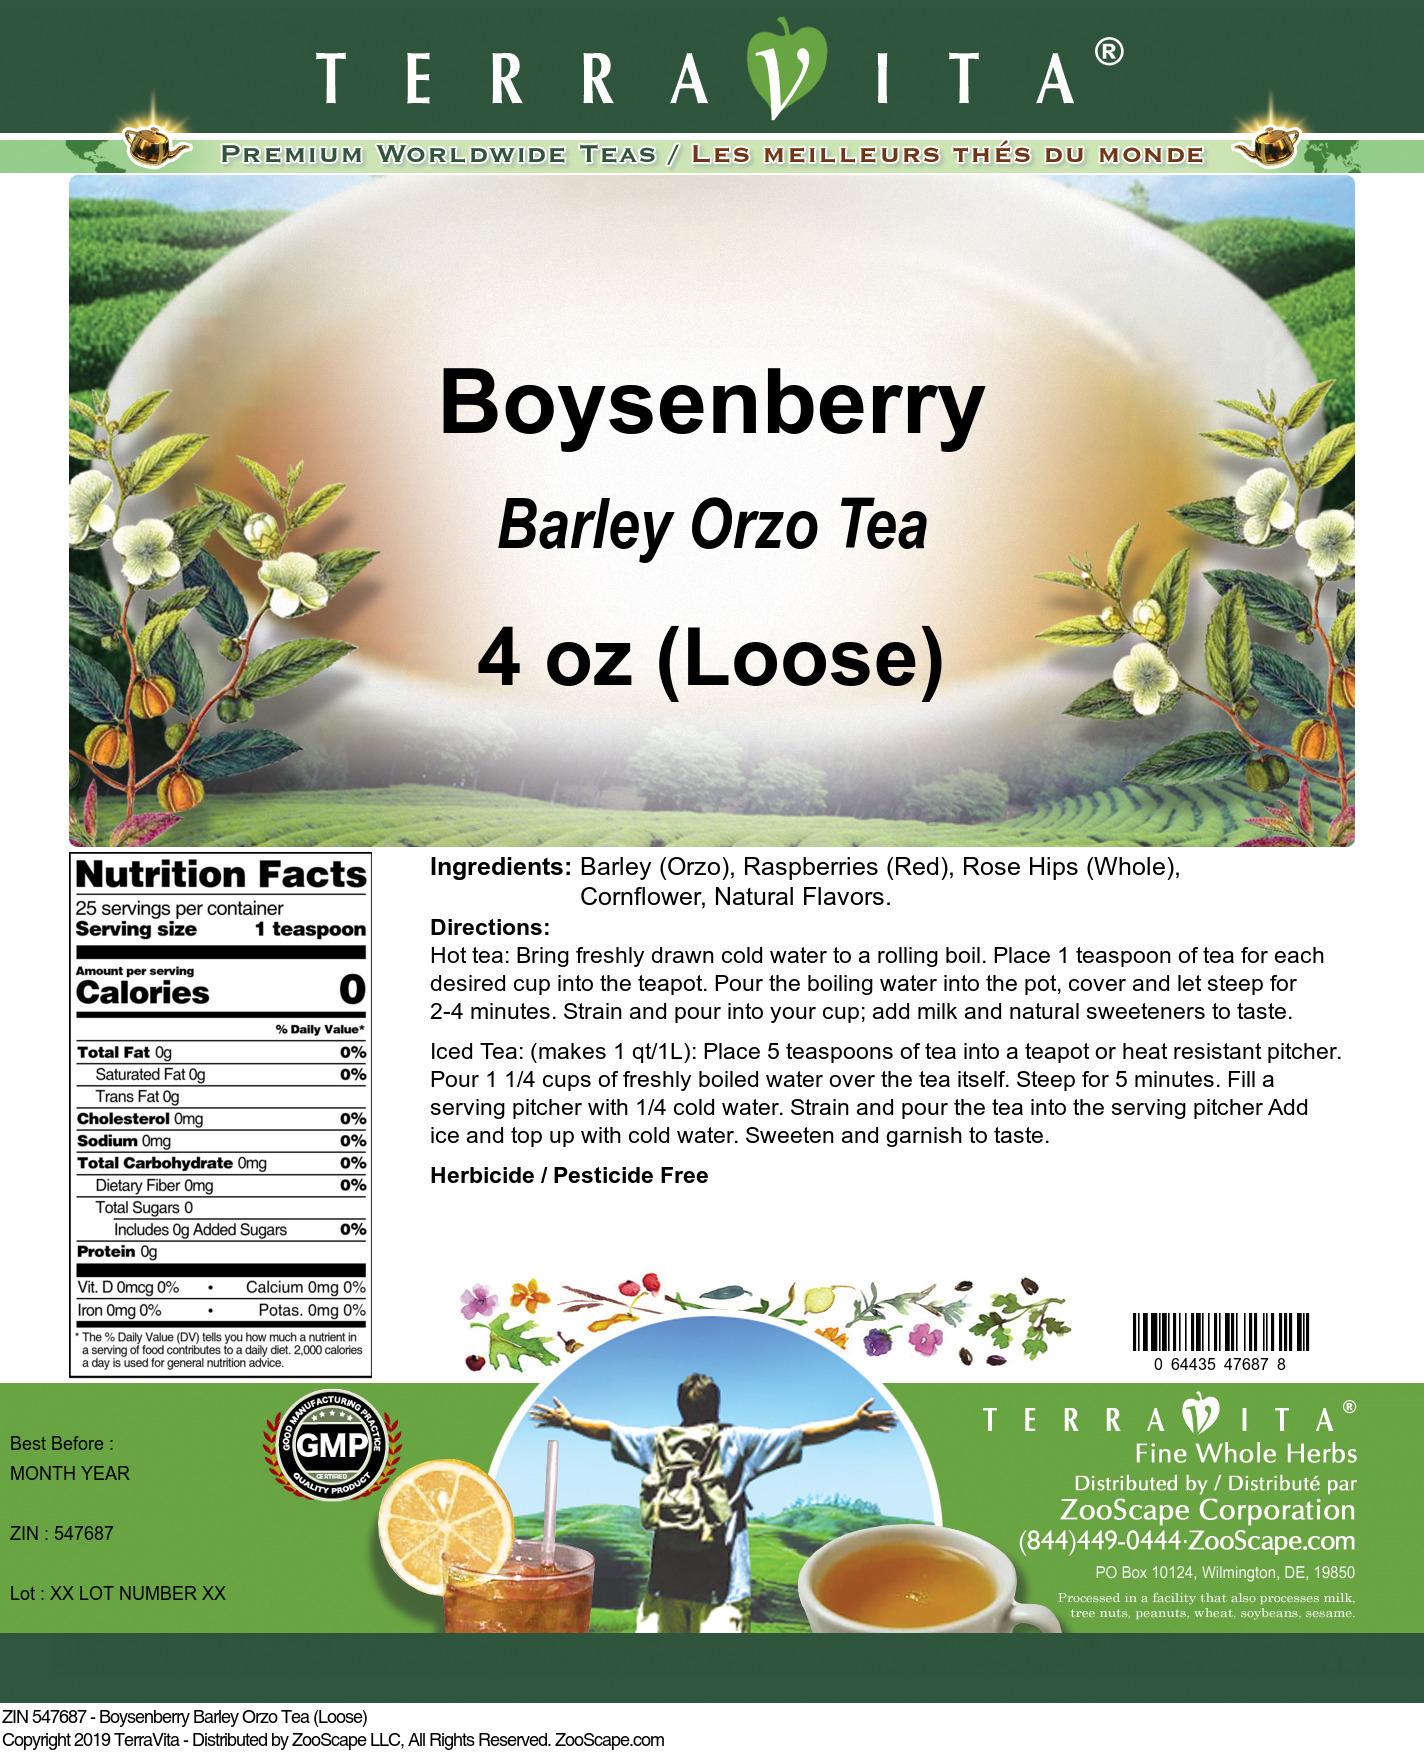 Boysenberry Barley Orzo